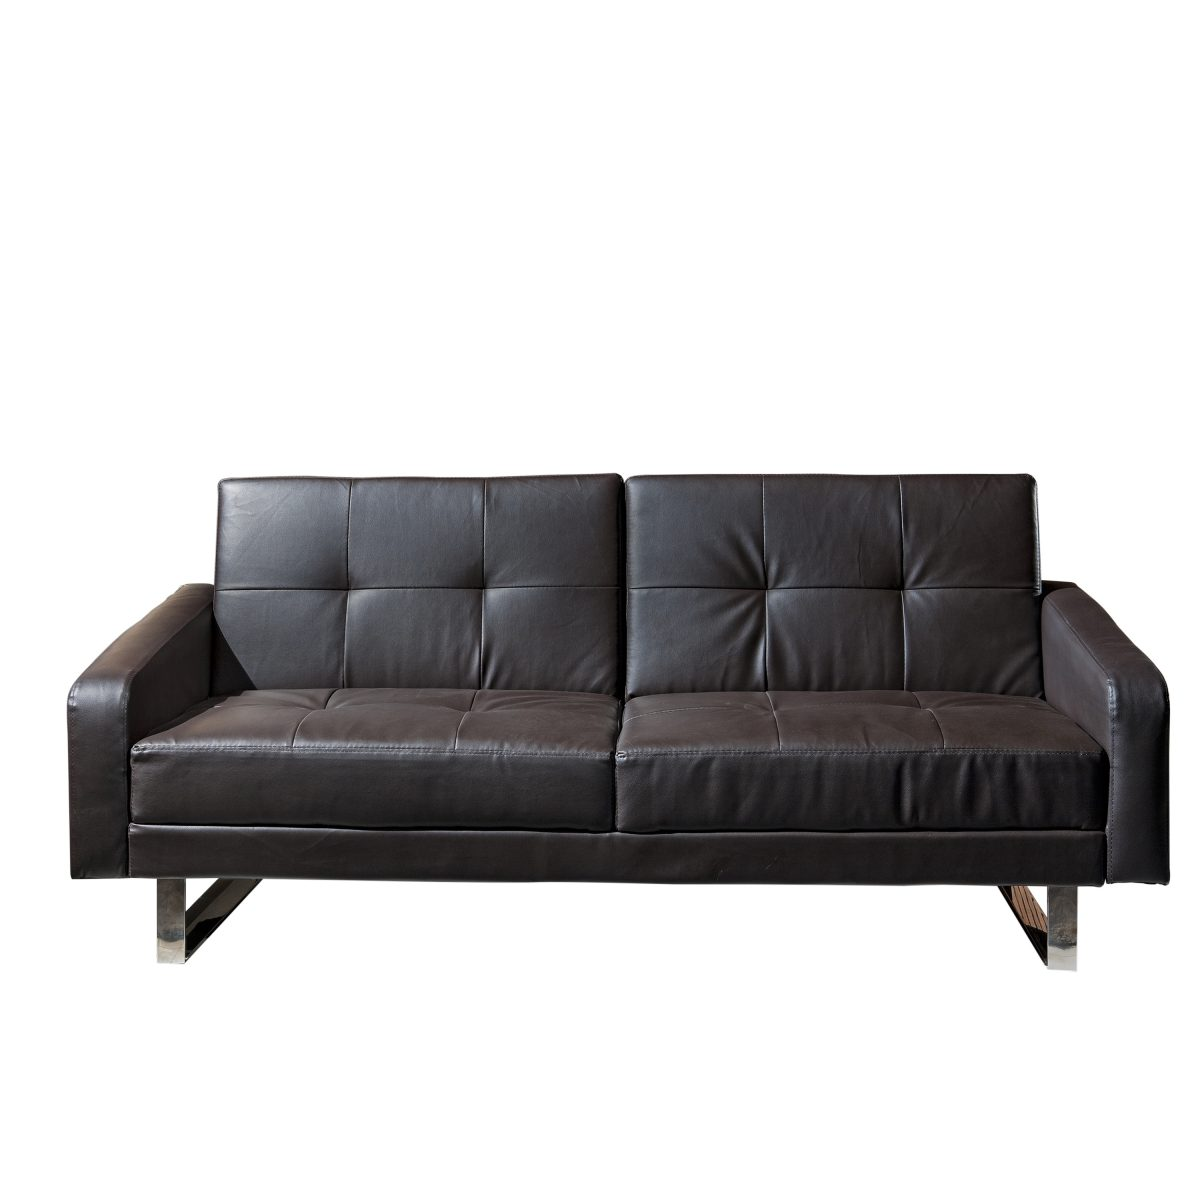 Beau Borealis Black Polyurethane Sofa Bed With Stainless Steel Legs